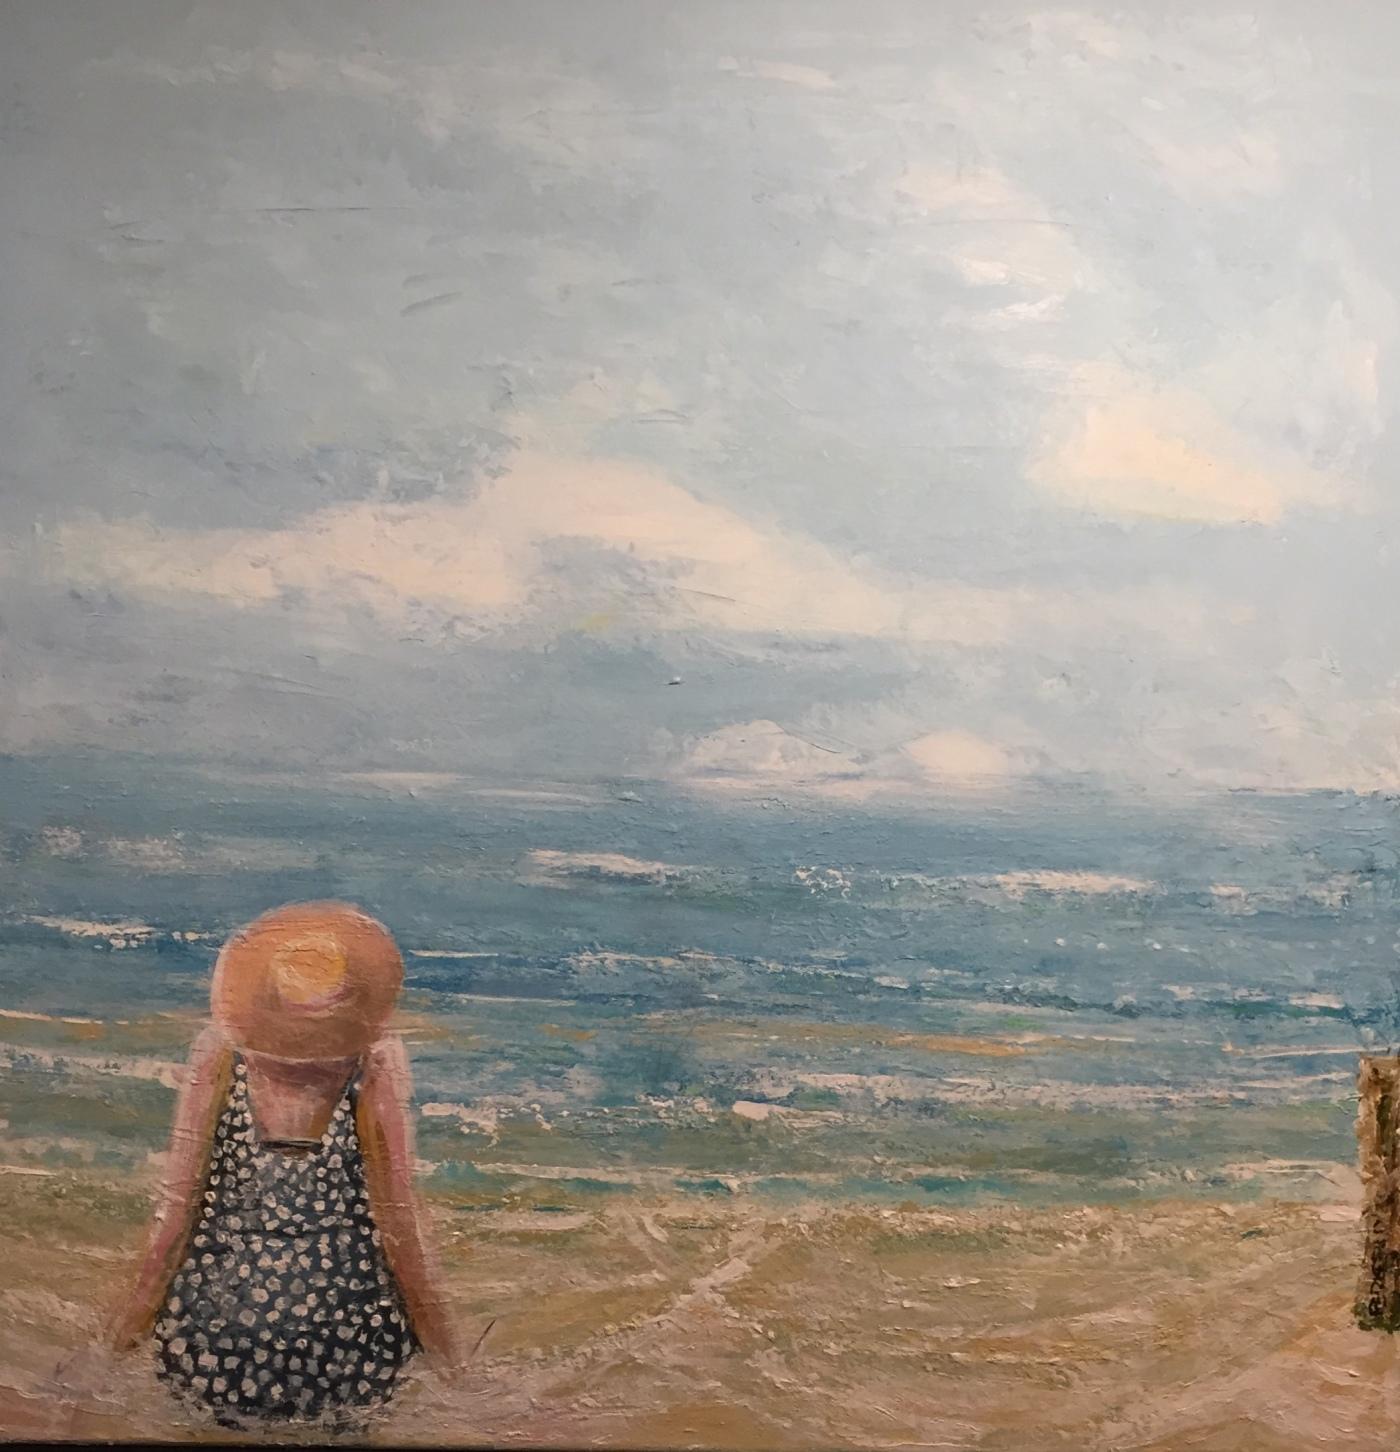 Per Kjeld maleri med titlen; Med r.ven i vandskorpen